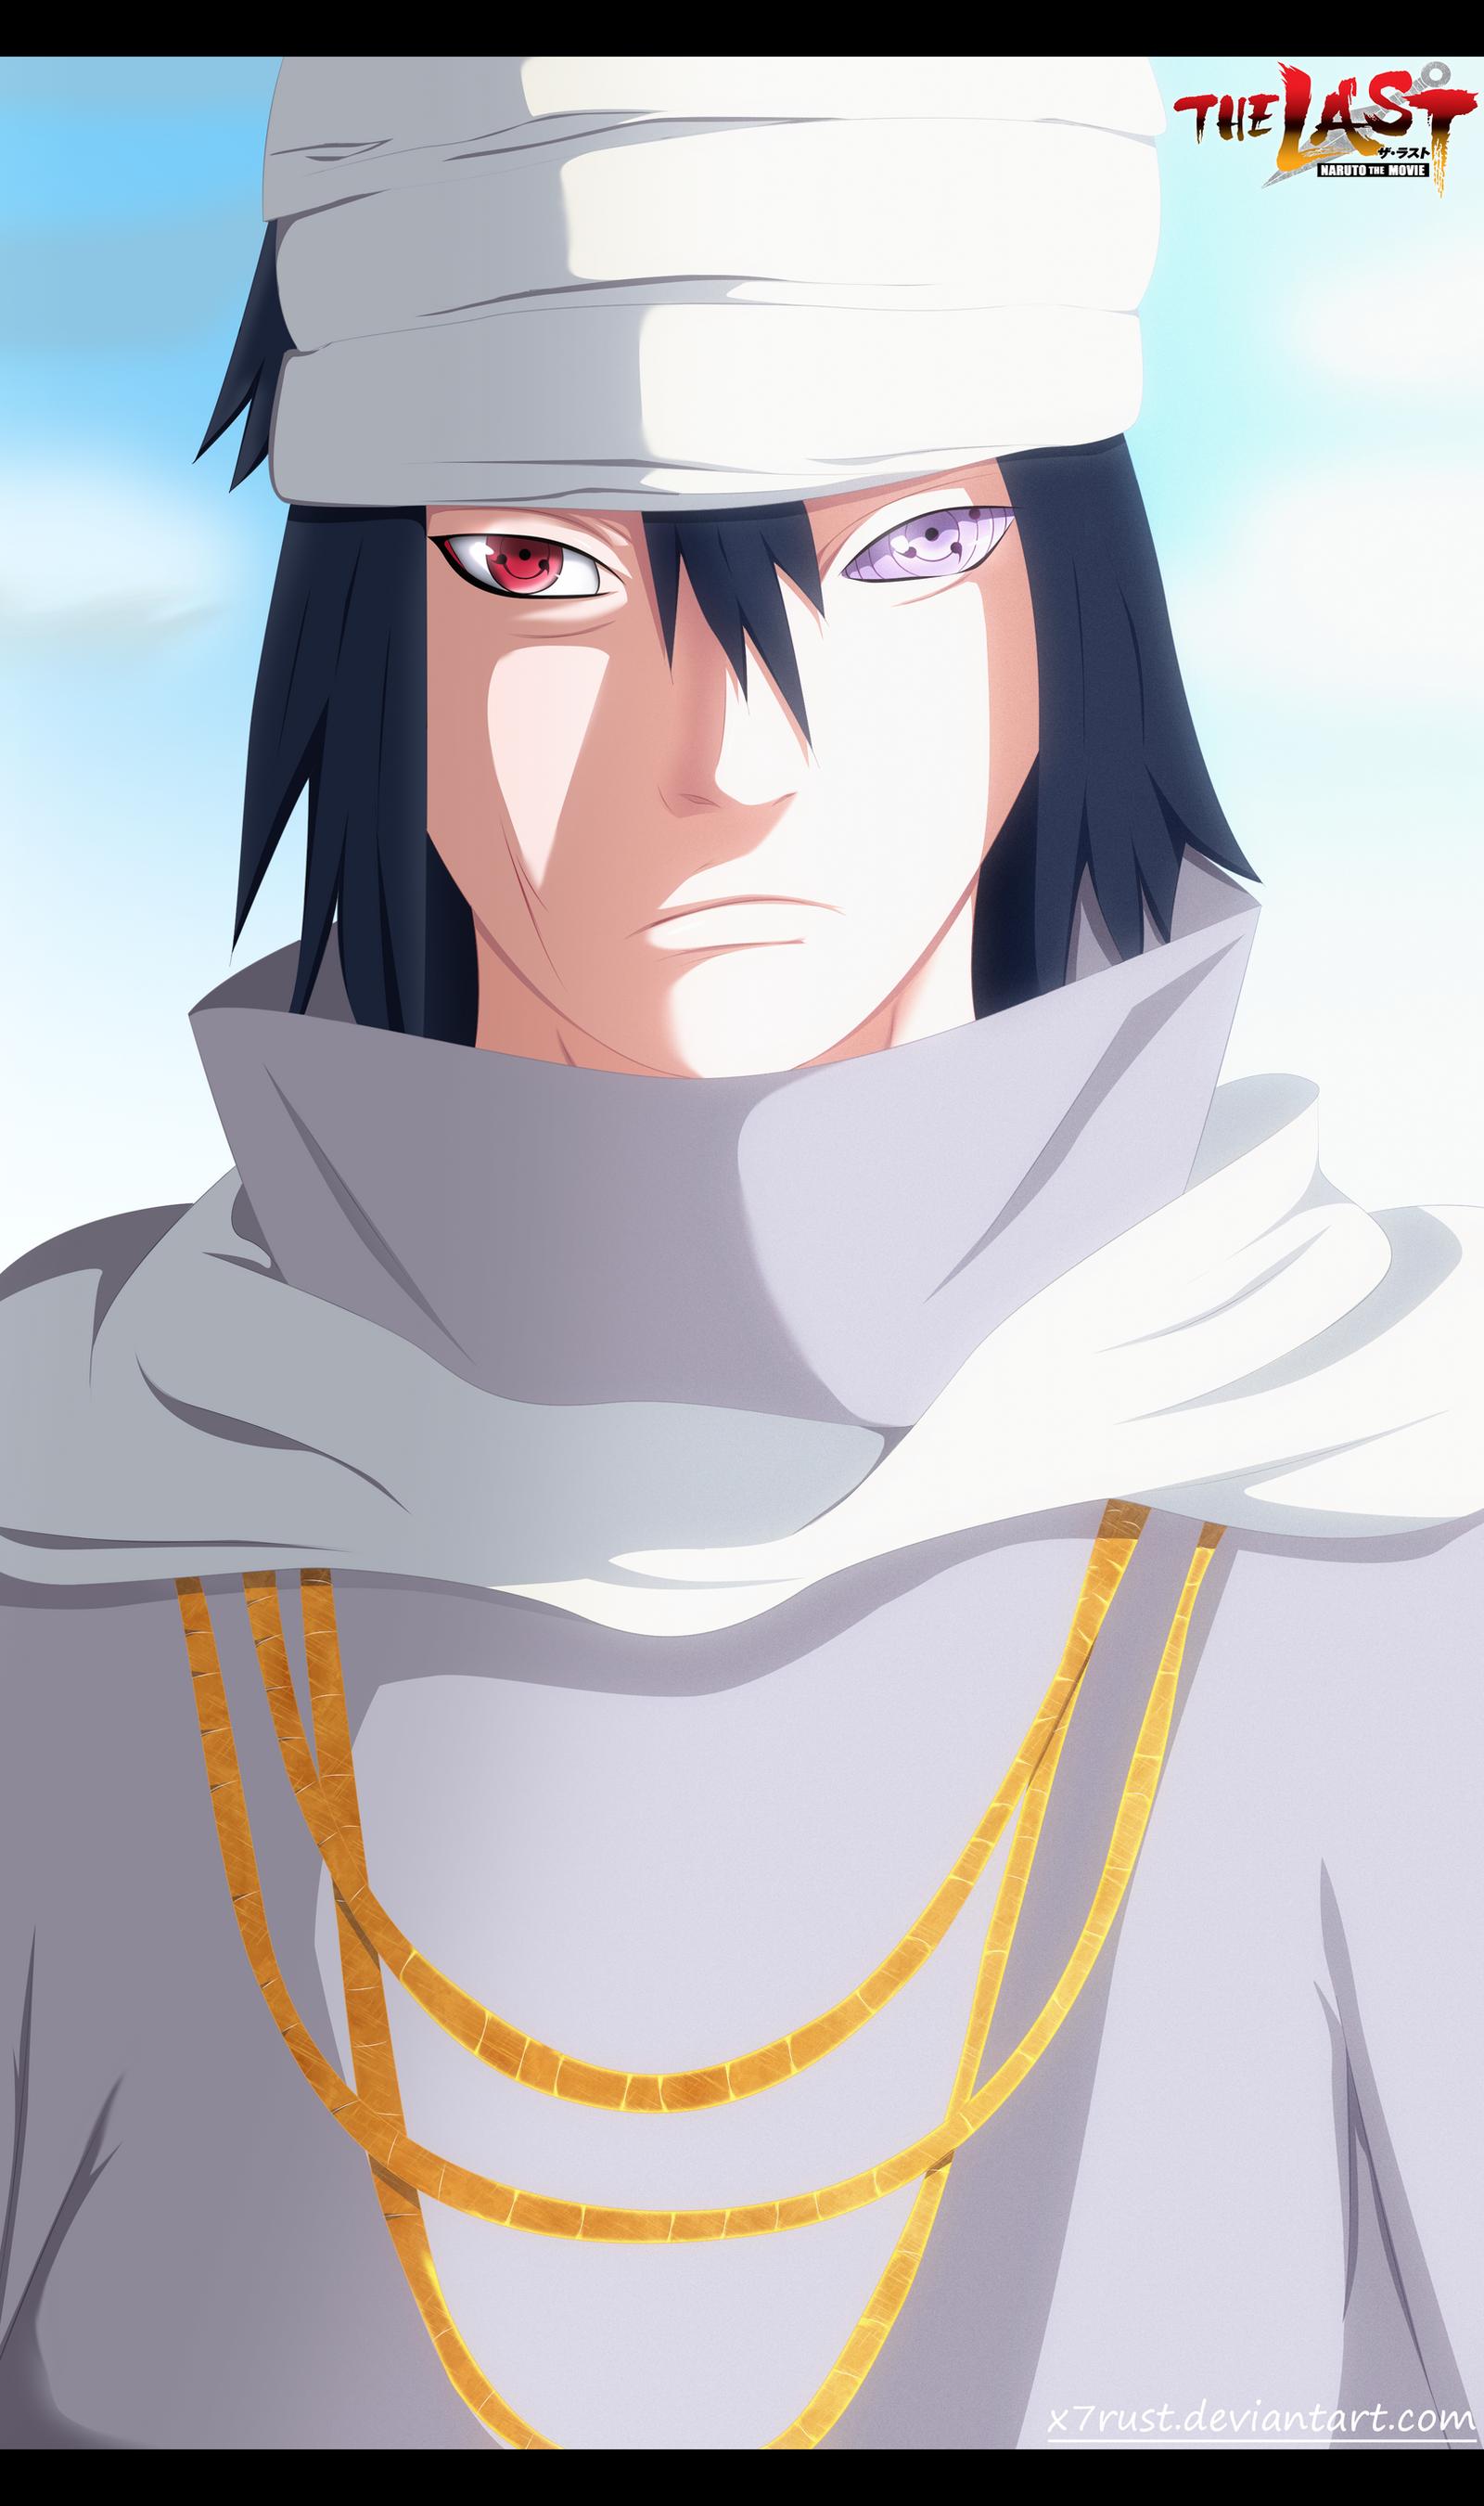 Naruto The last movie - Sasuke by X7Rust on DeviantArt